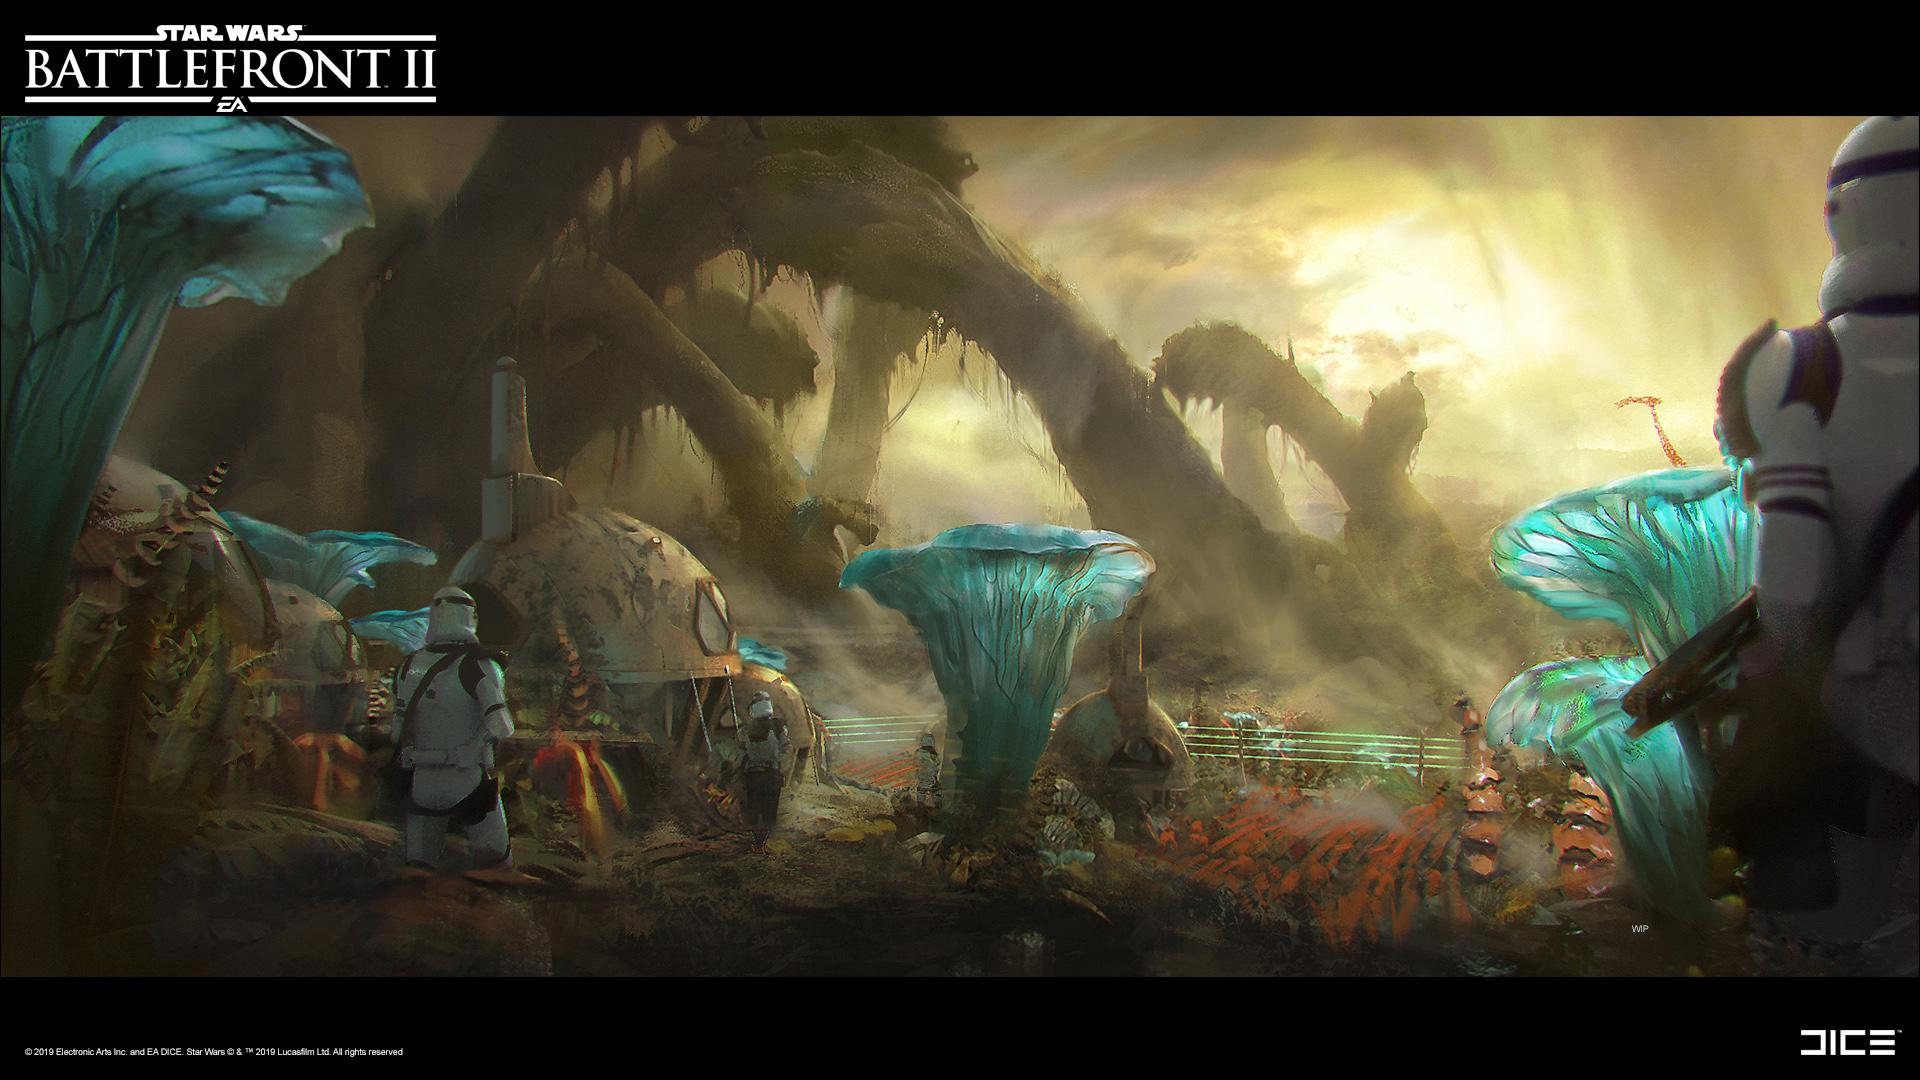 Star Wars Battlefront 2 Update 1 38 Adds Co Op Instant Action